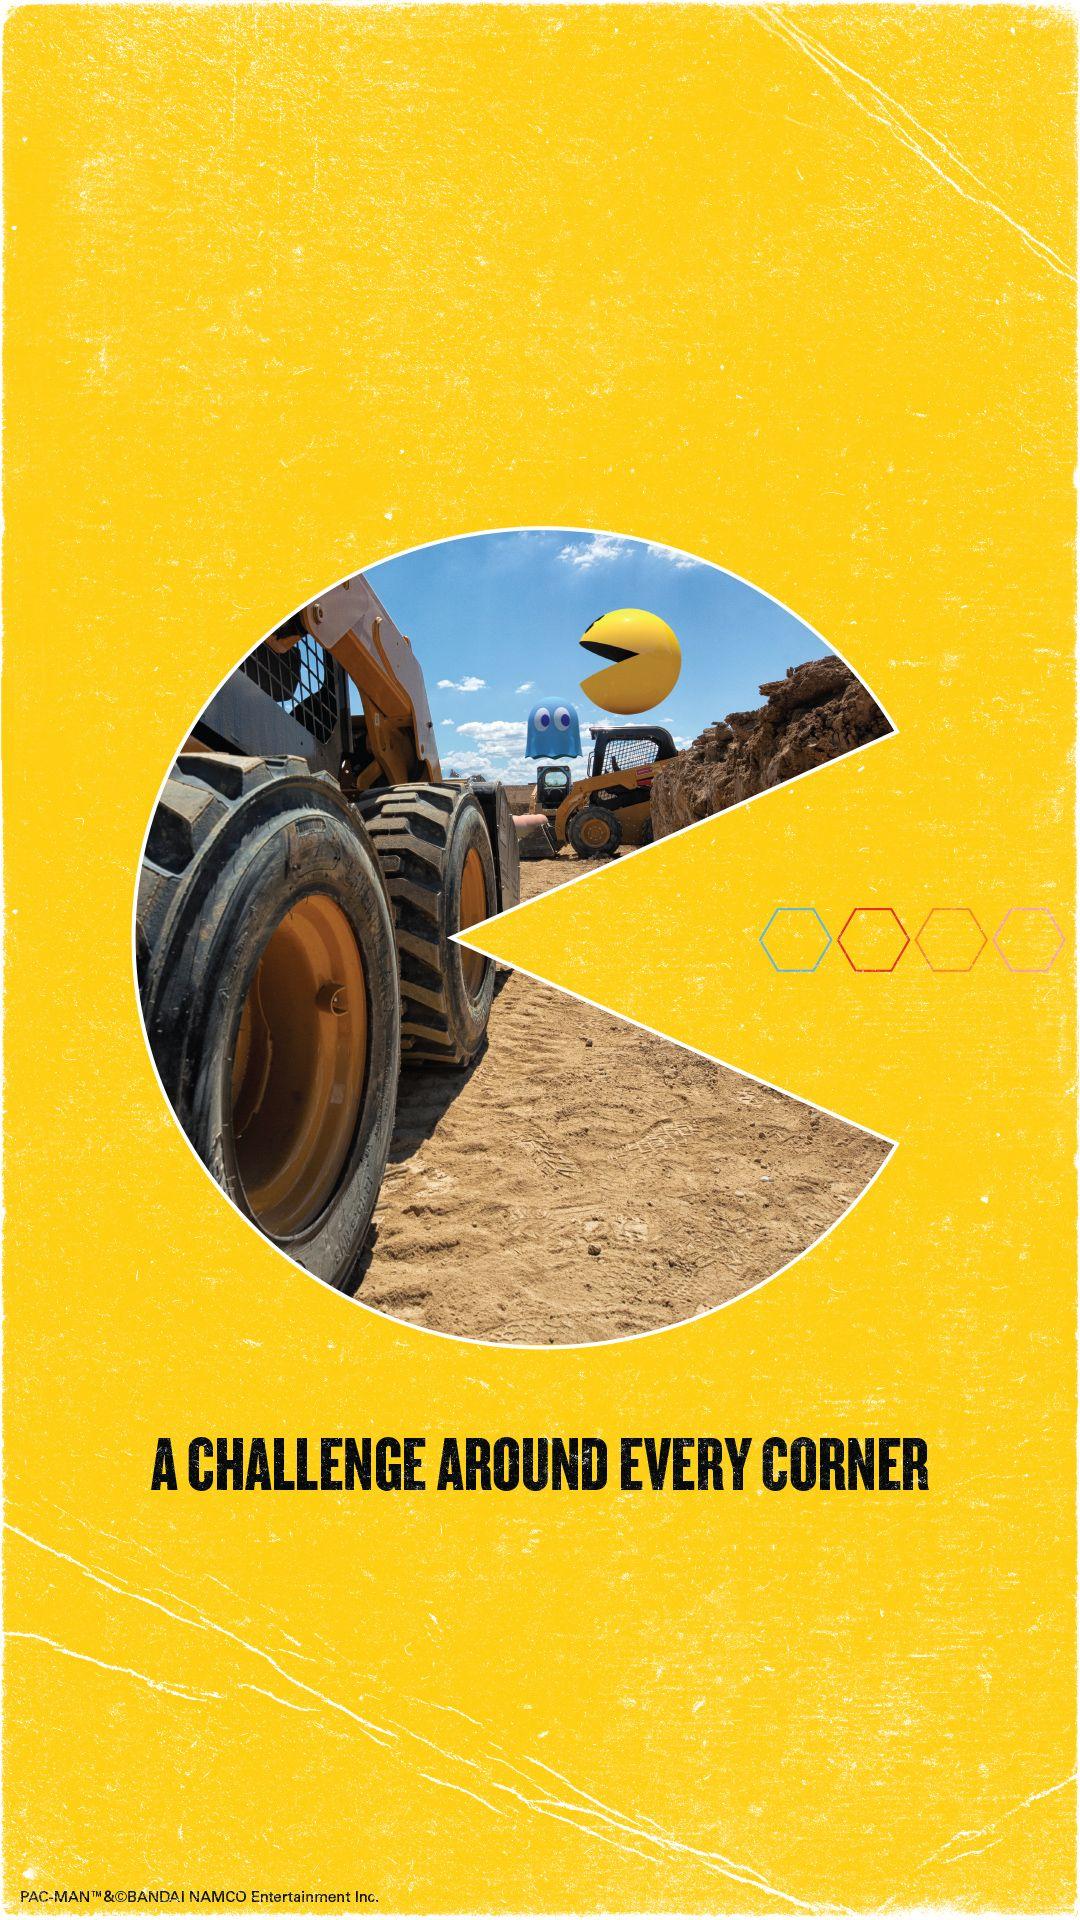 A challenge around every corner